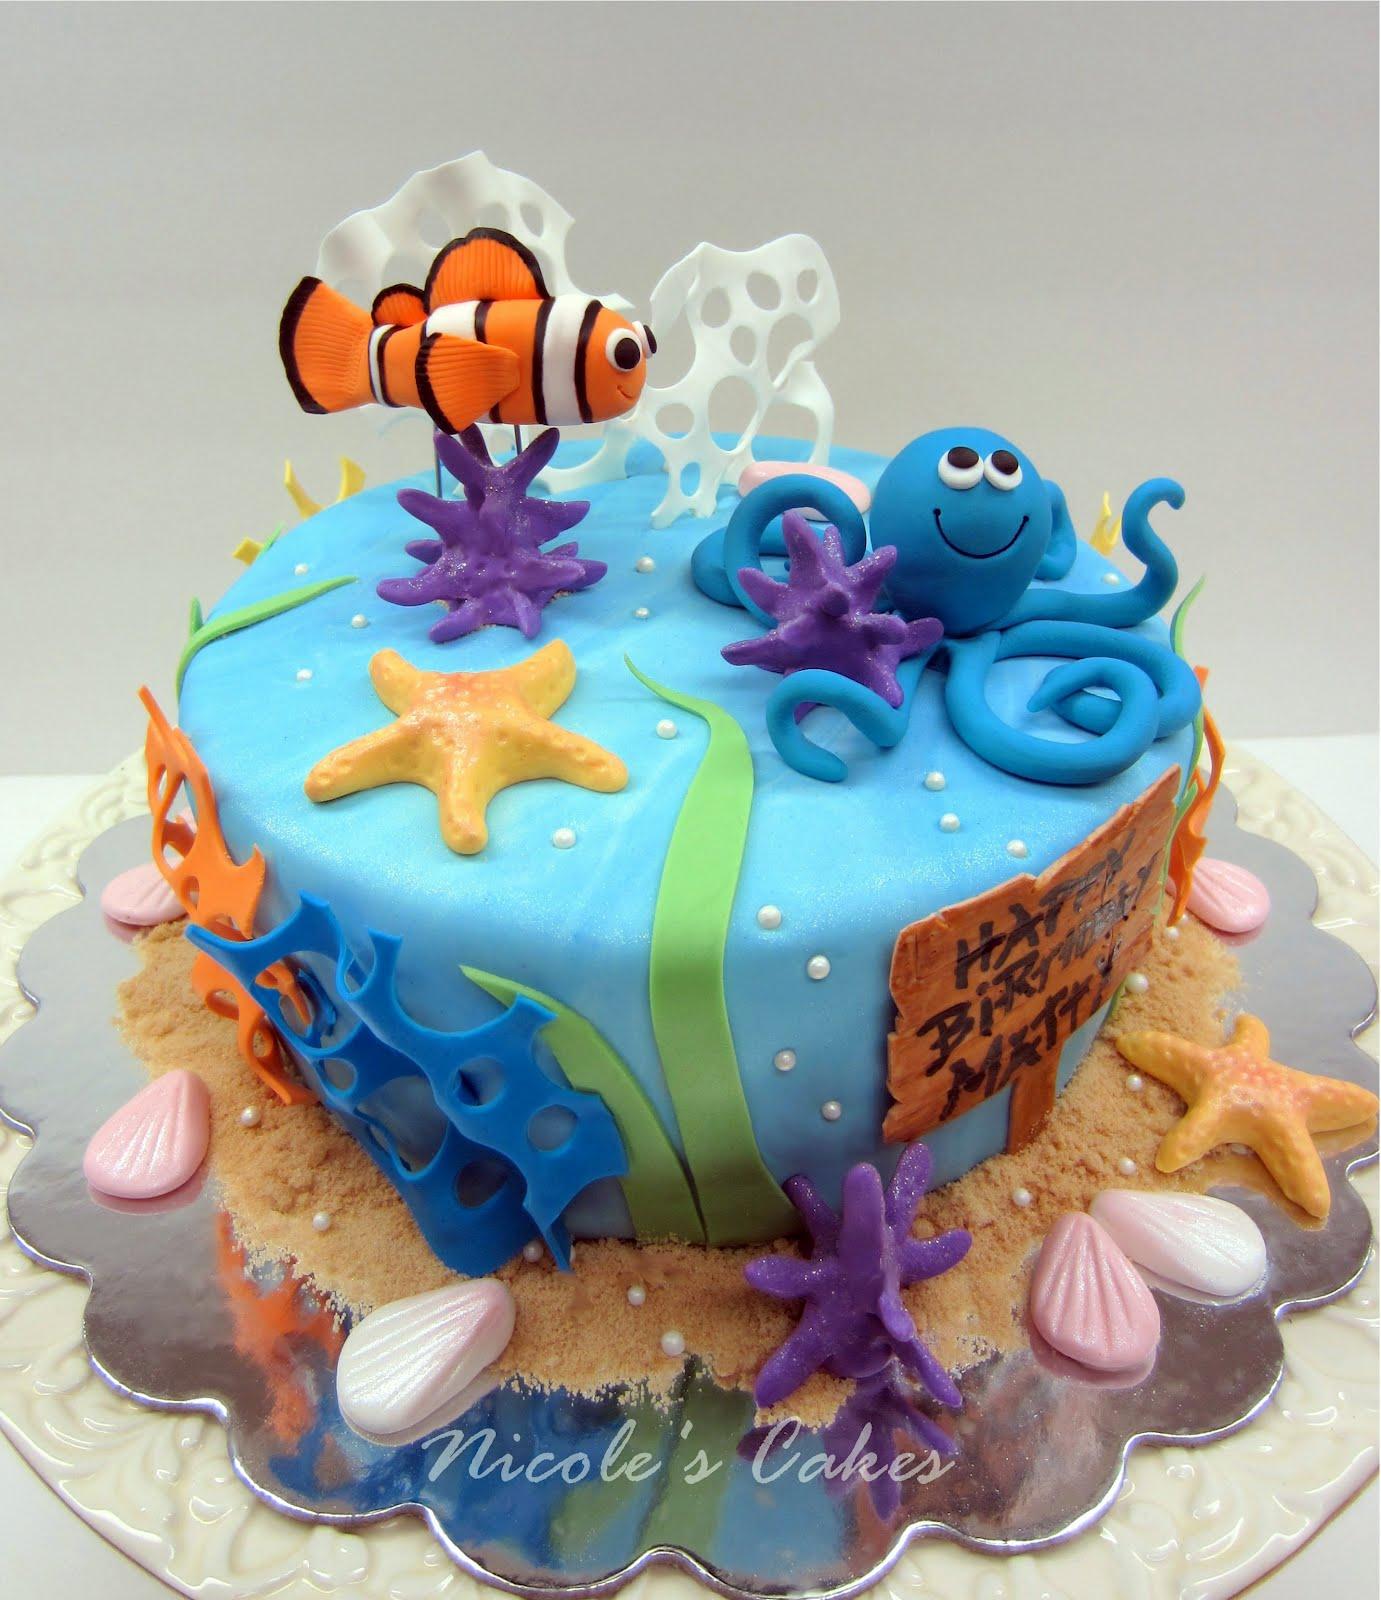 On birthday cakes under the sea birthday cake